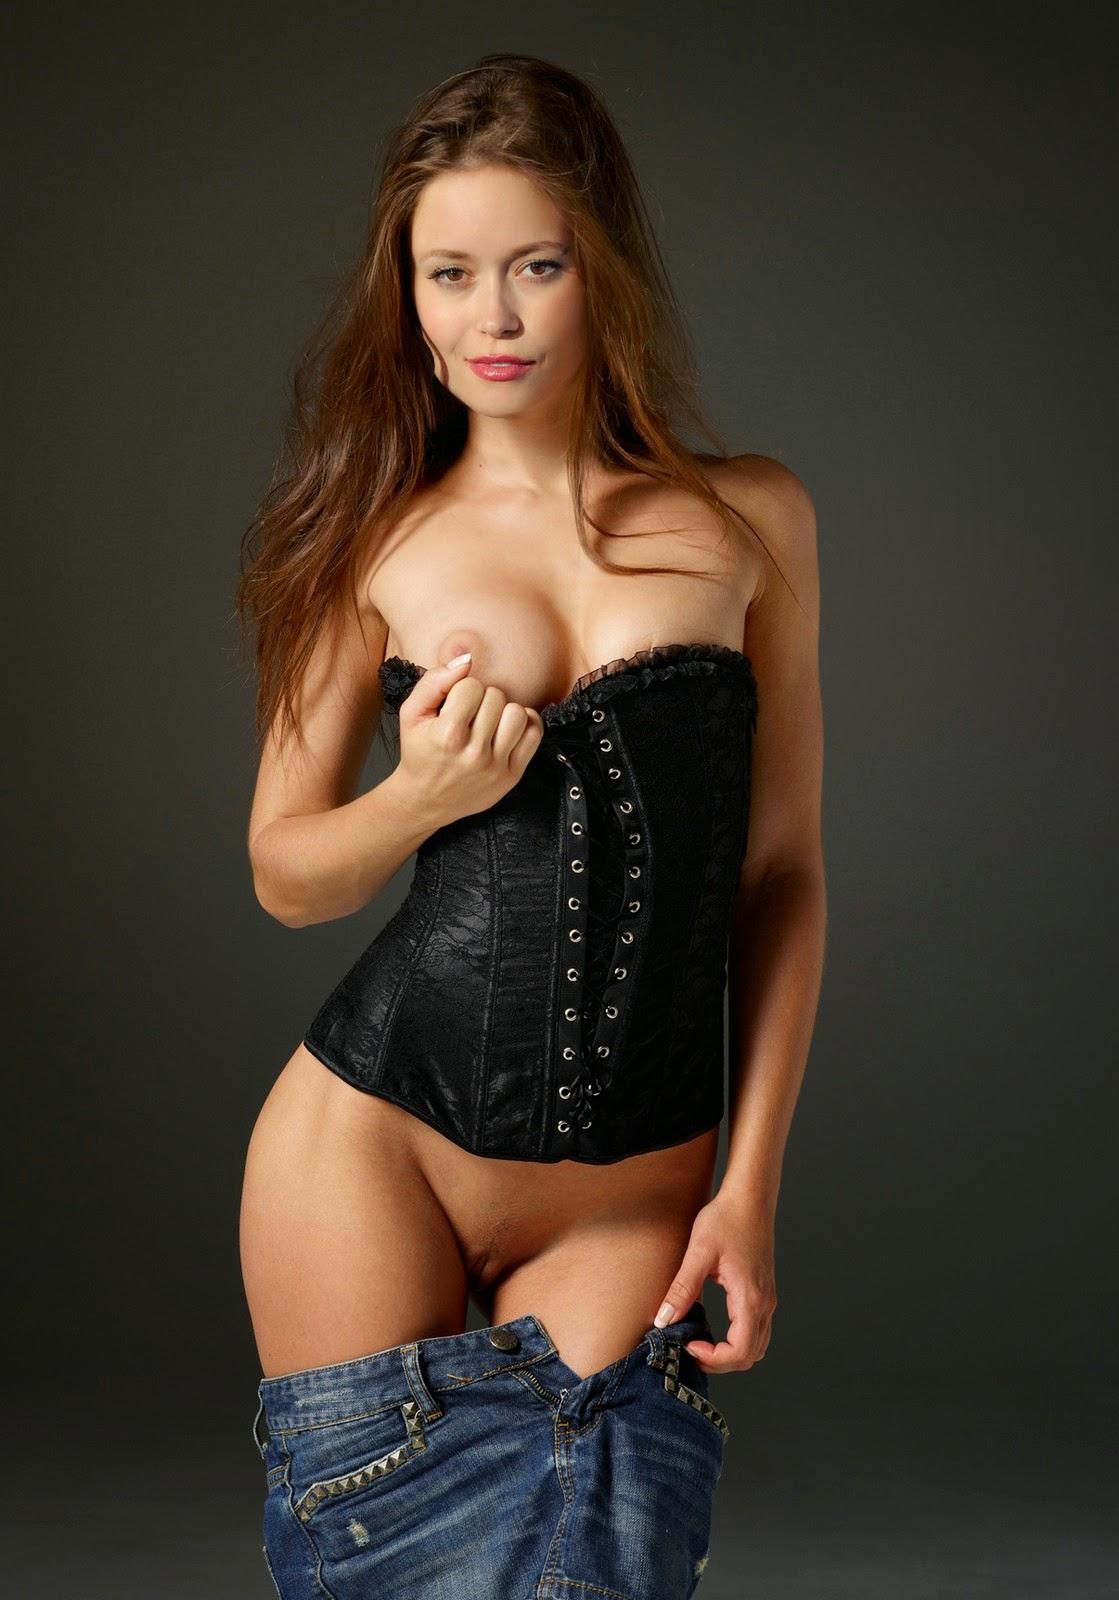 nude sexy hot schone frau